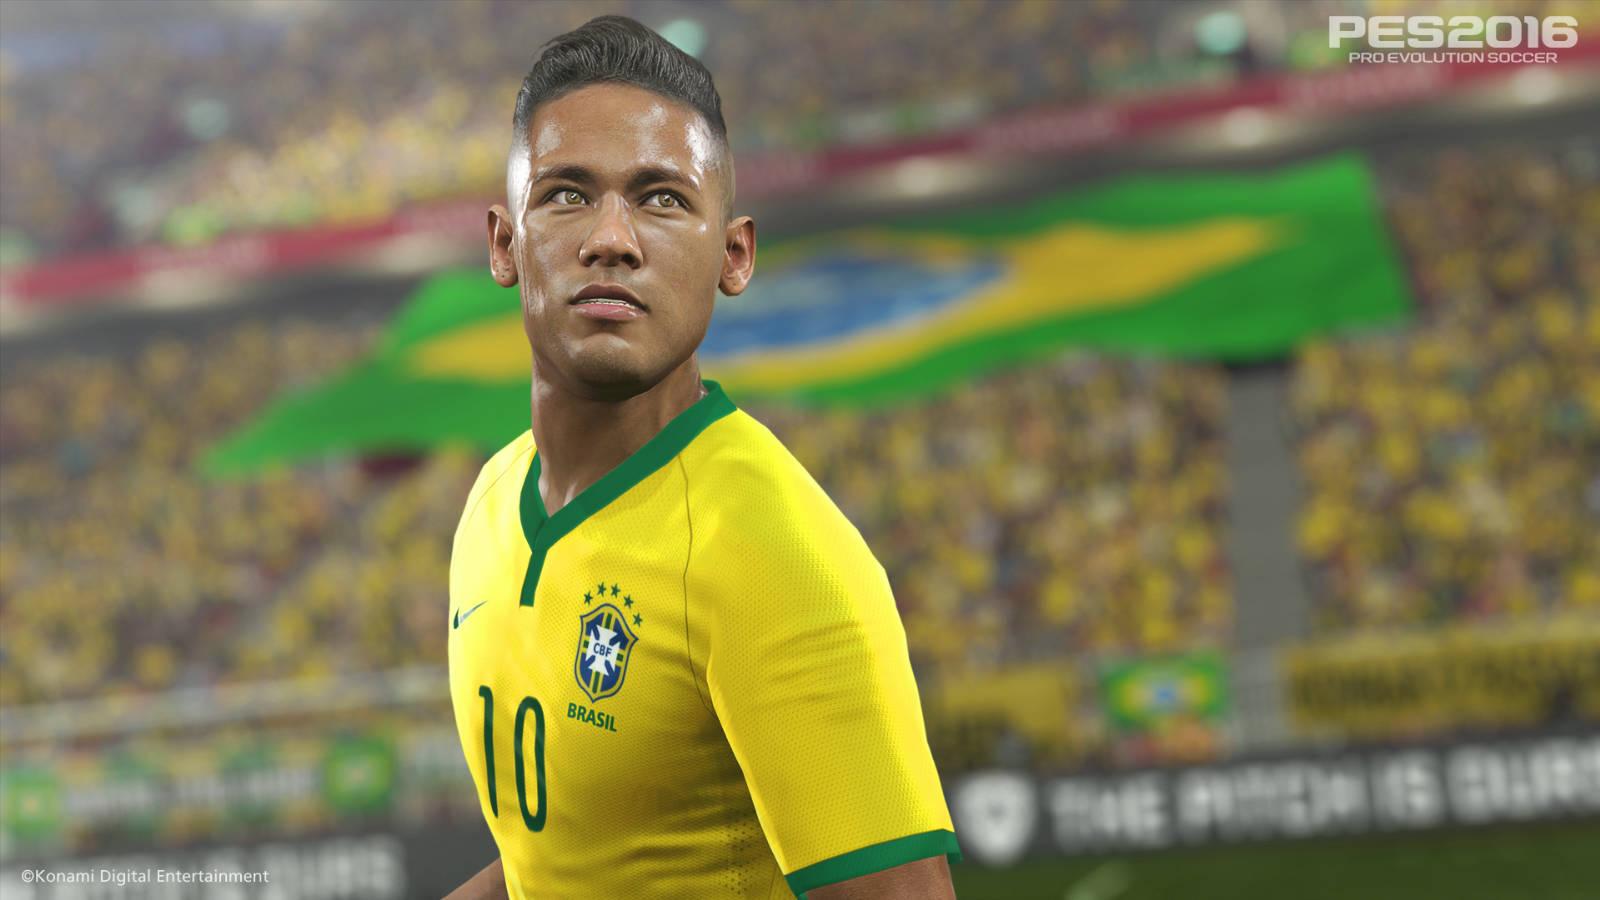 pes-2016-neymar-1.jpg